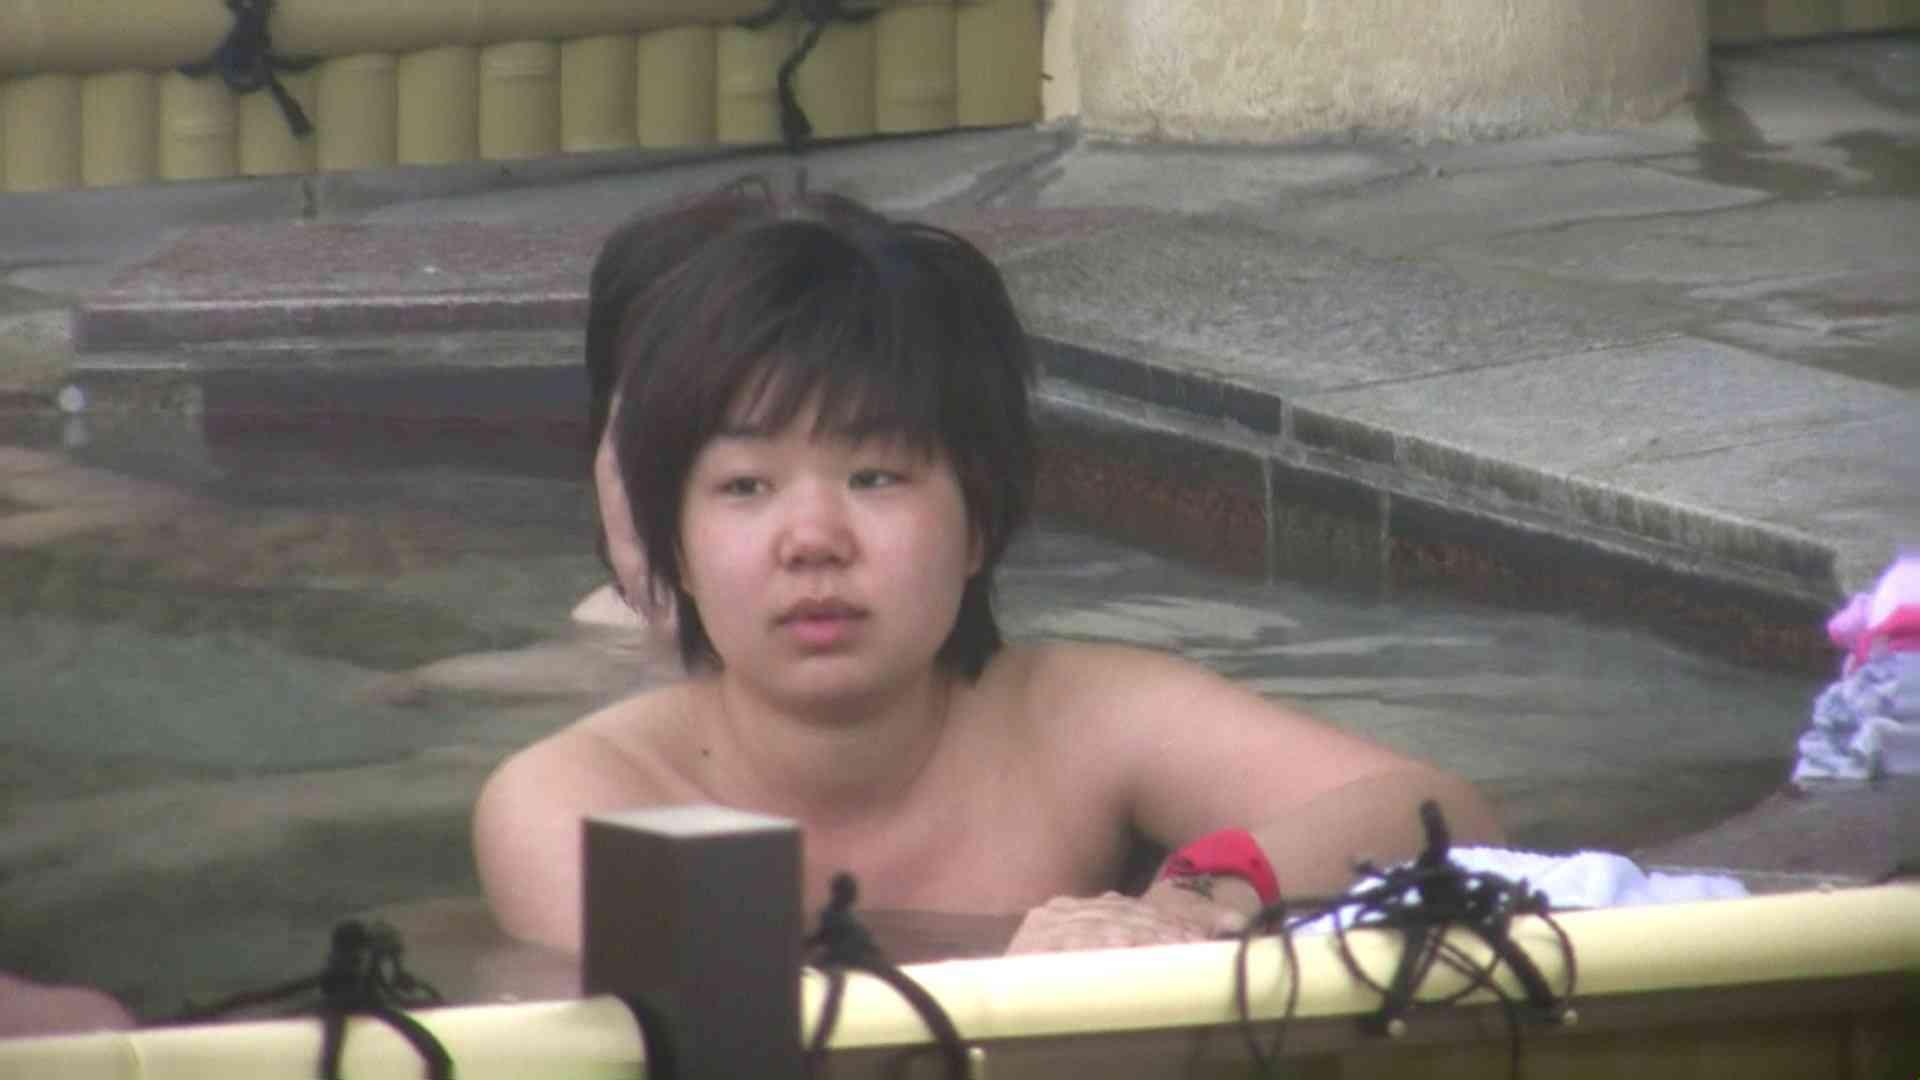 Aquaな露天風呂Vol.53【VIP限定】 OLエロ画像 盗撮おめこ無修正動画無料 54PICs 2